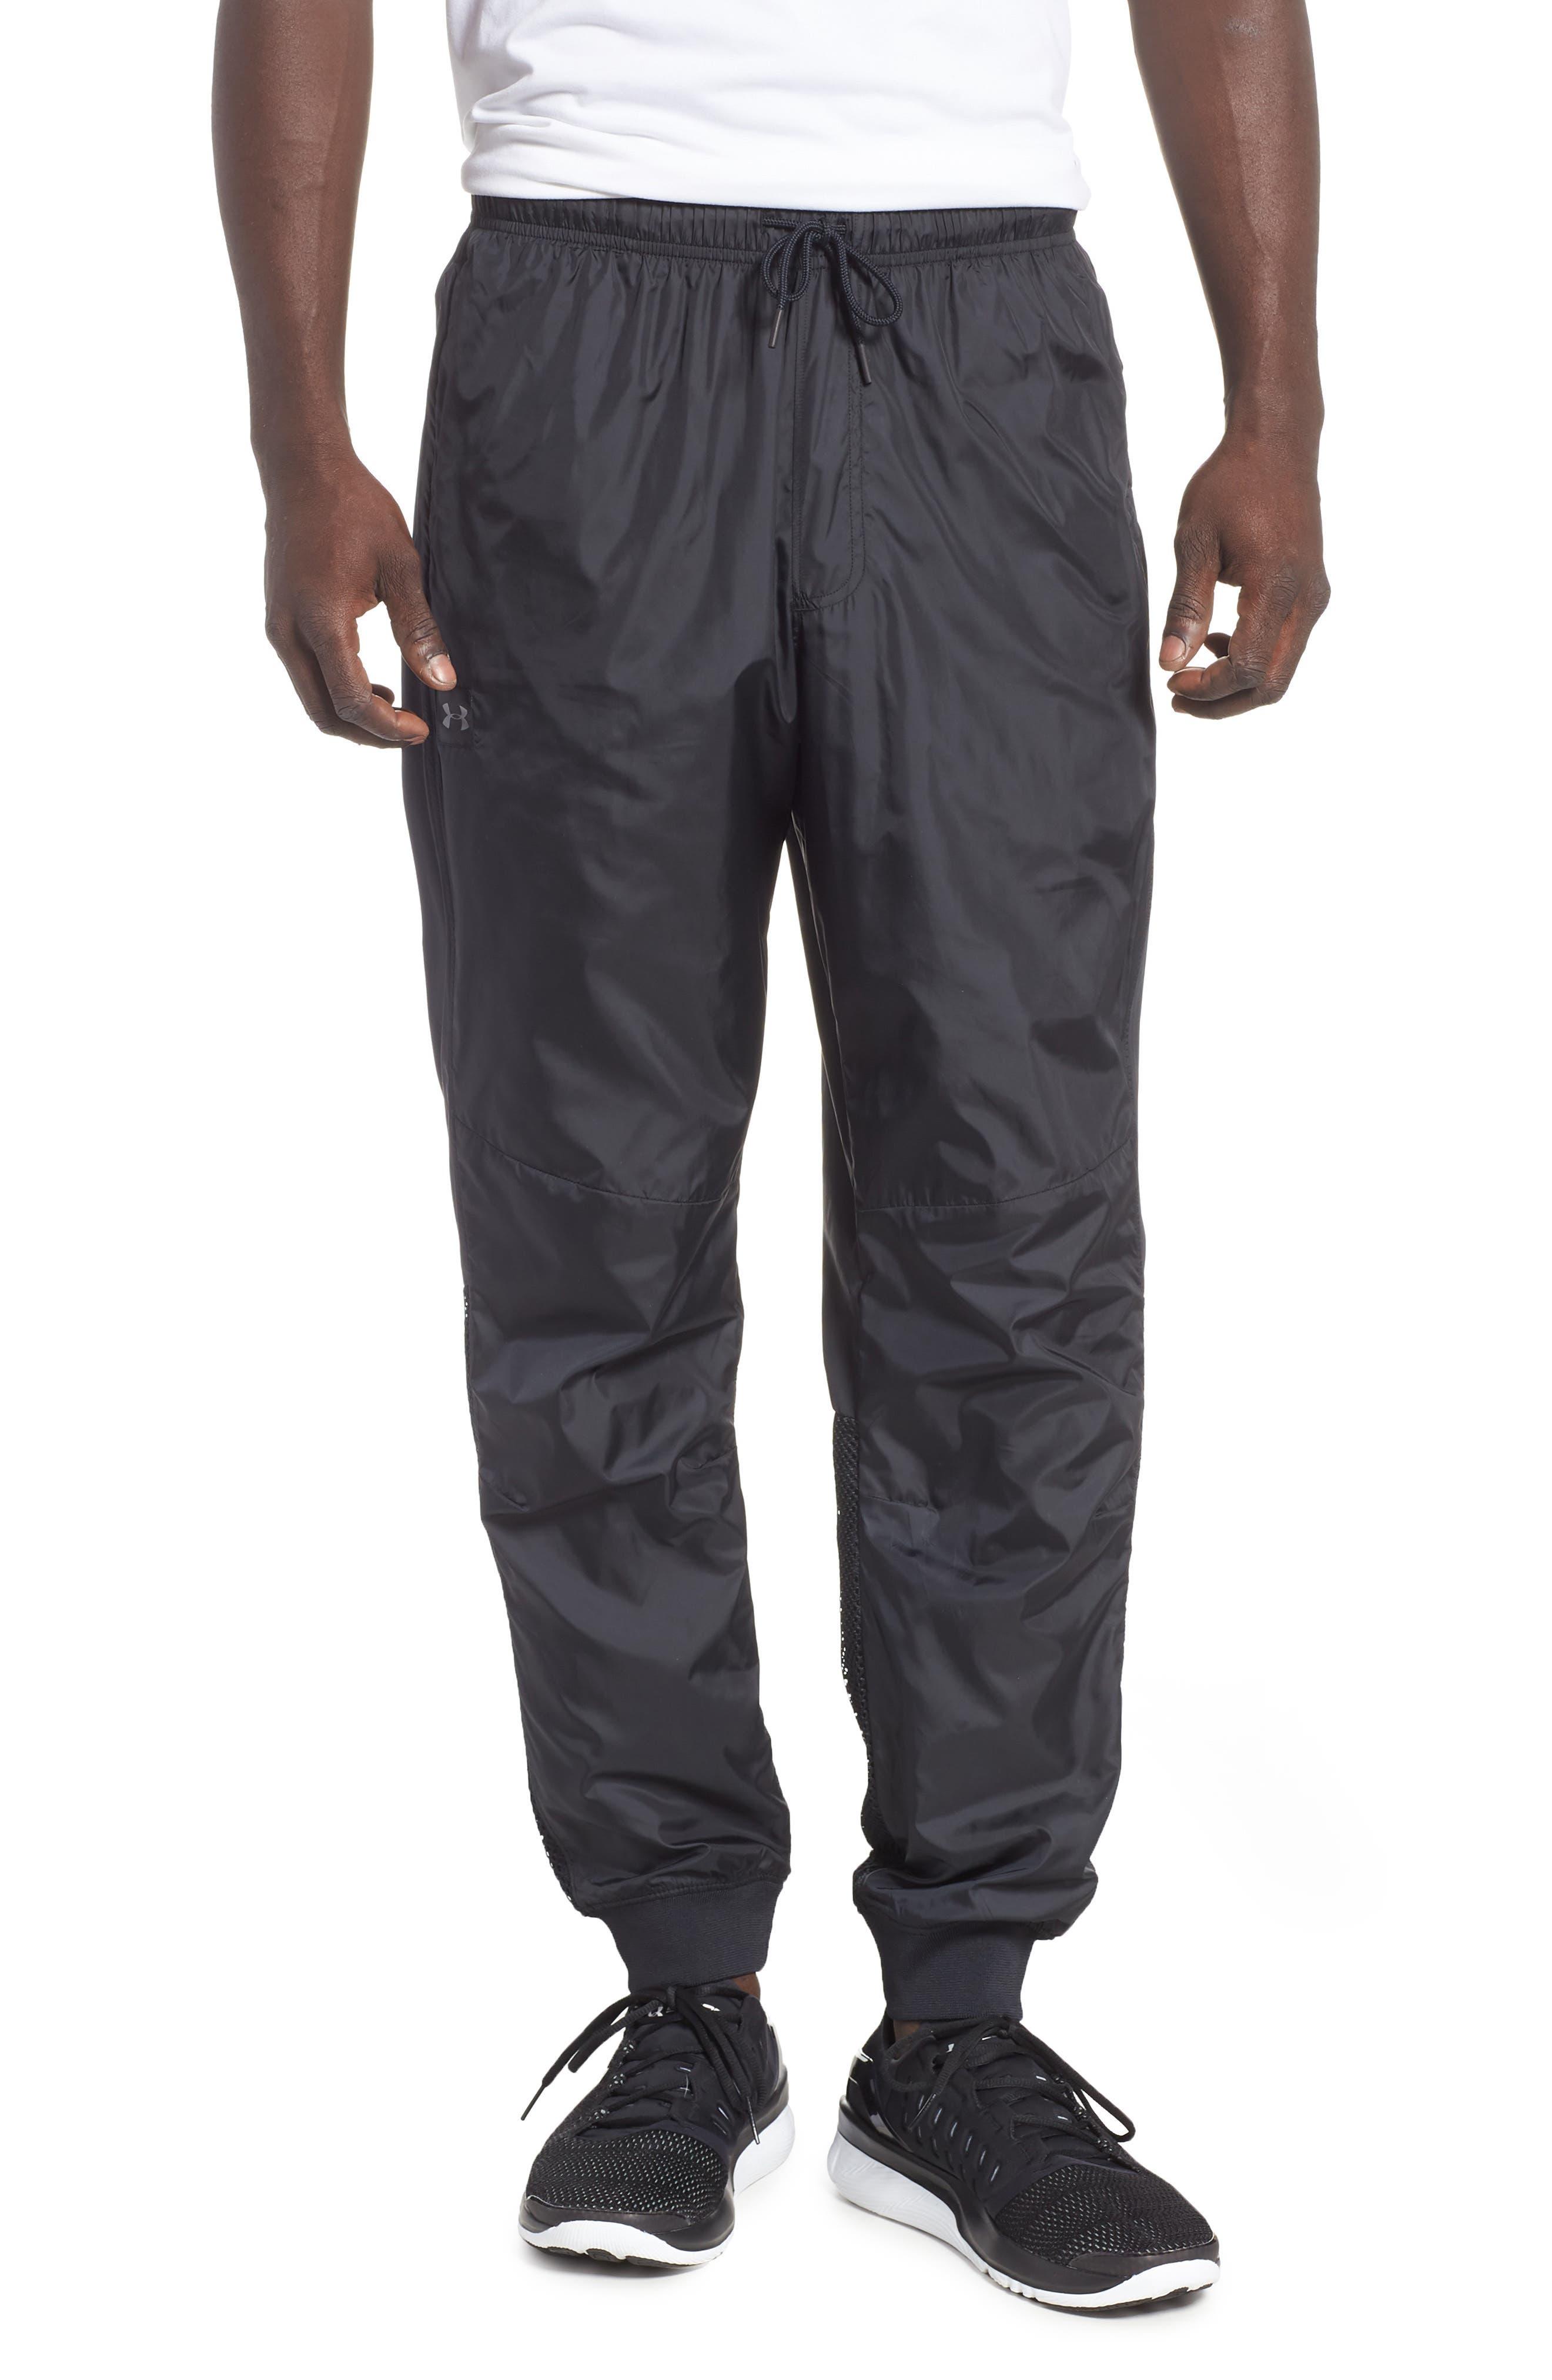 UNDER ARMOUR Sportstyle Wind Pants, Main, color, BLACK